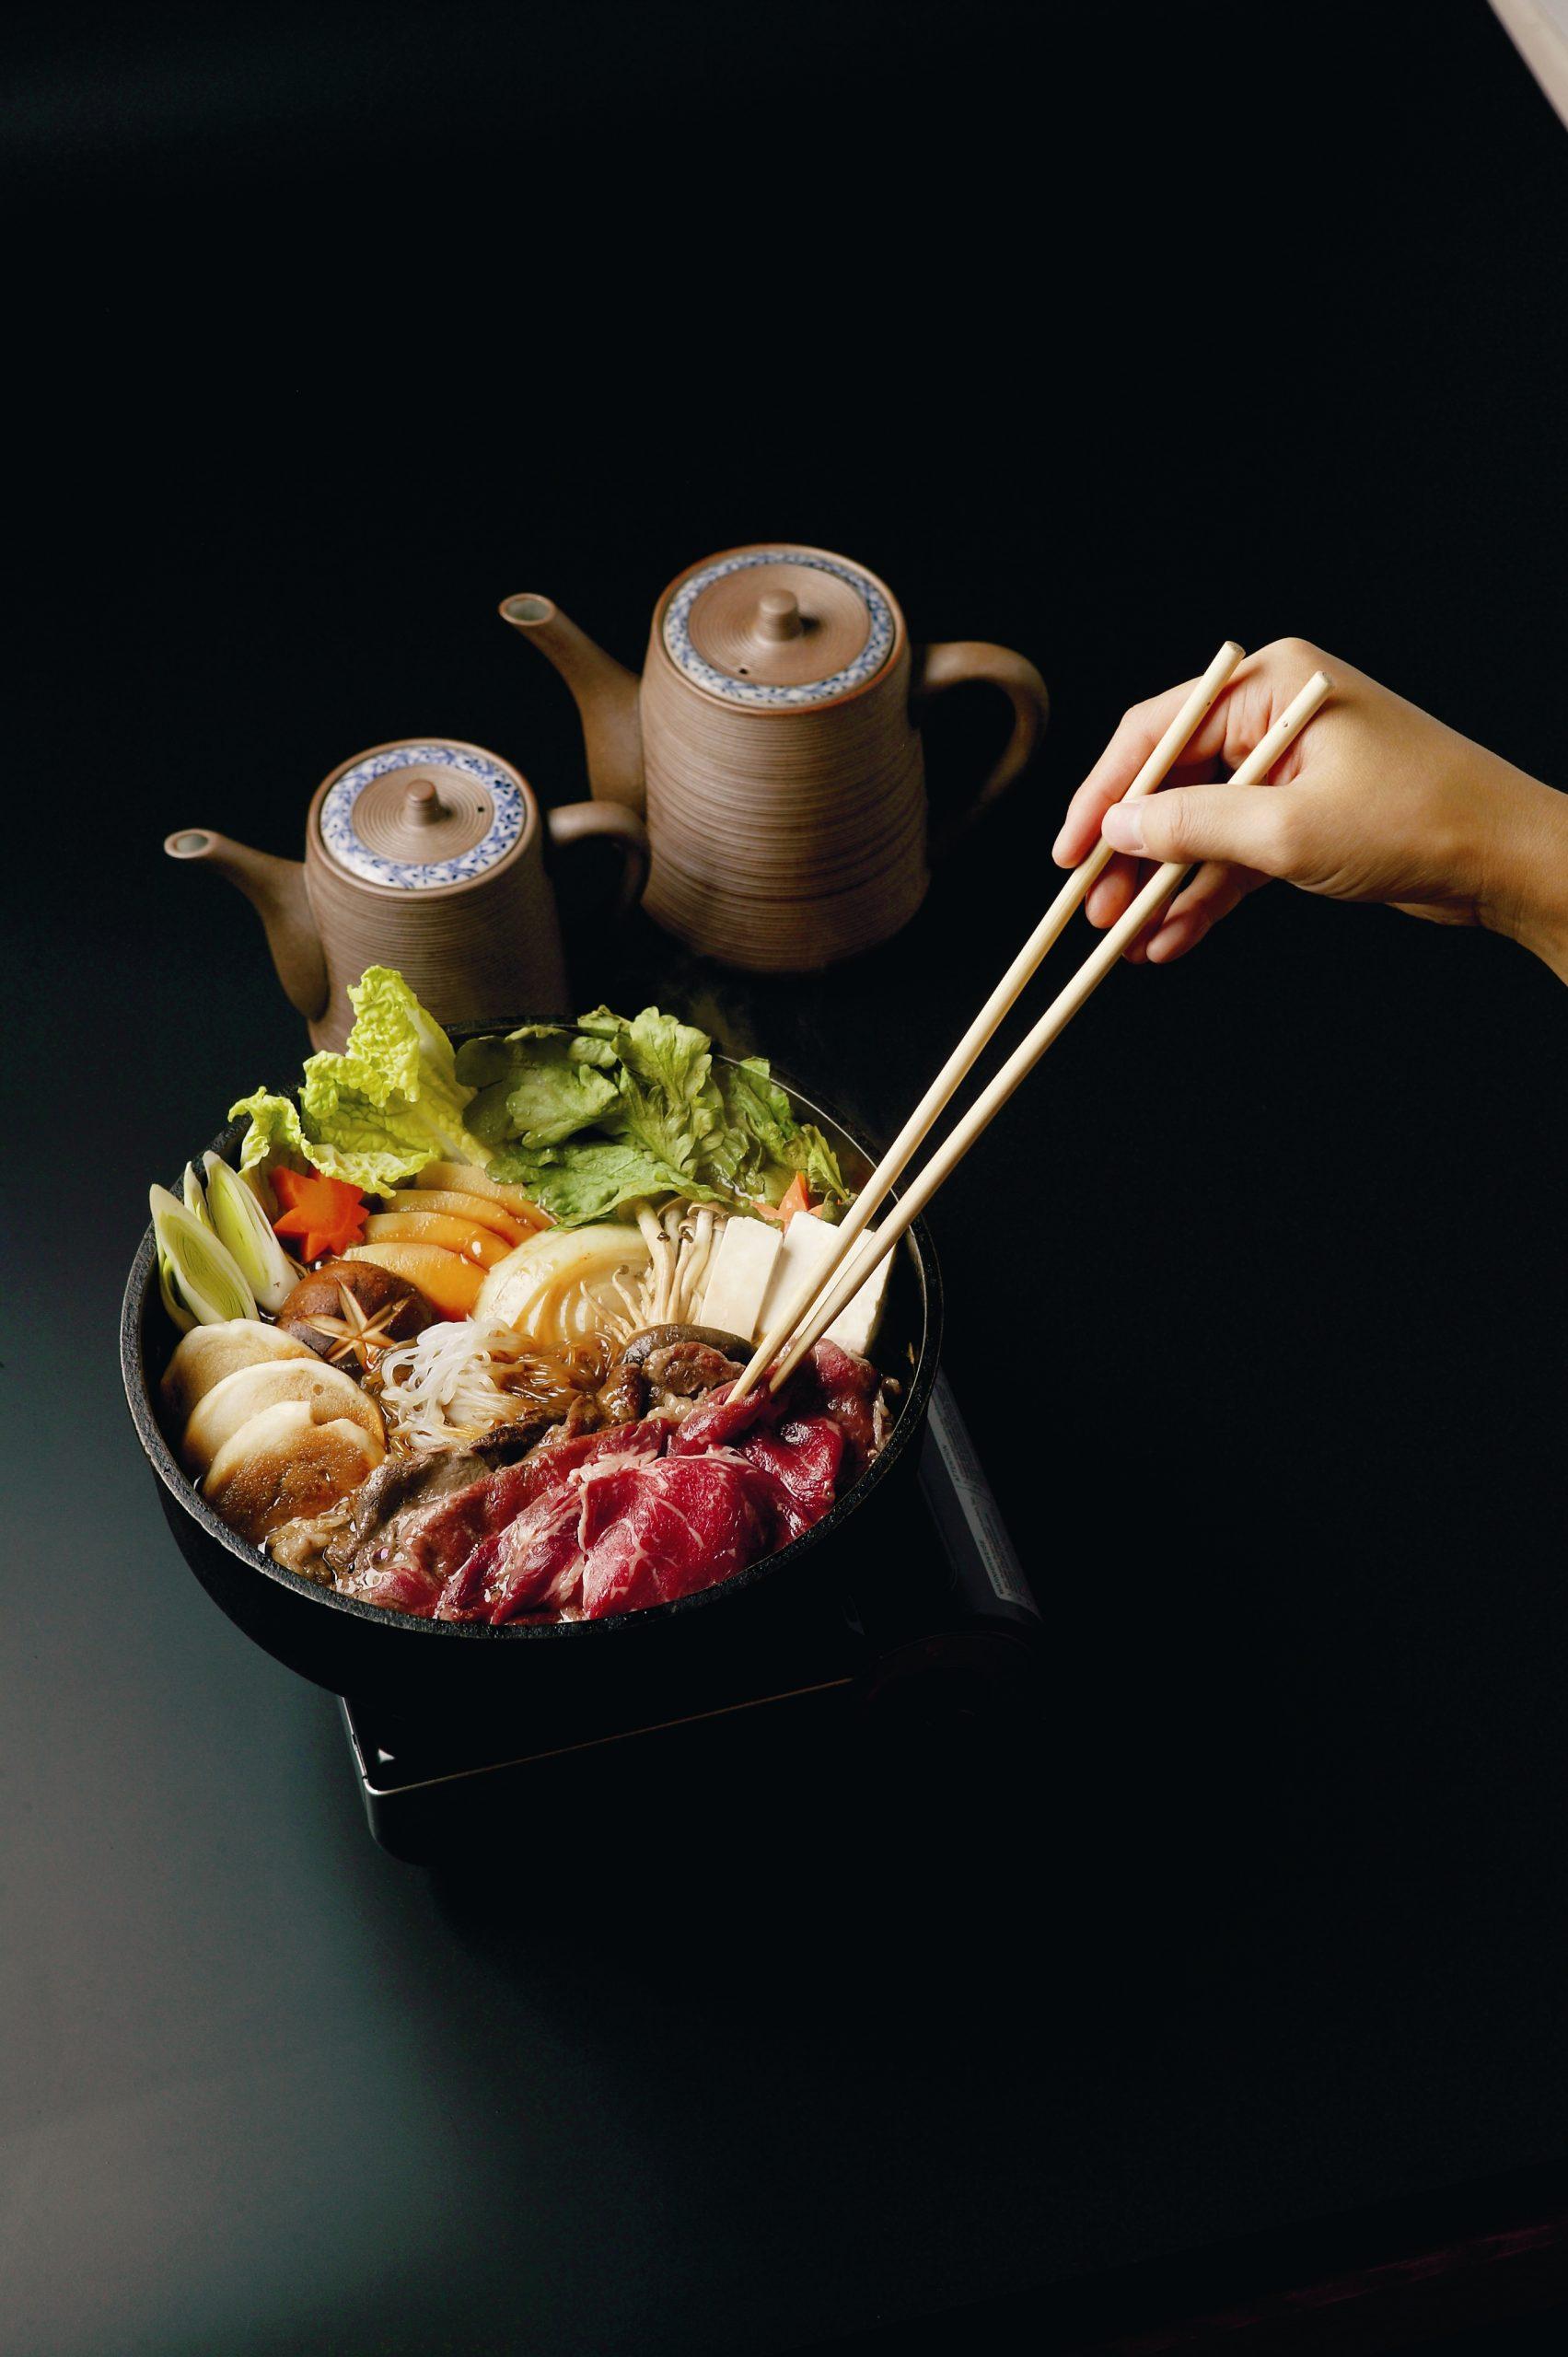 Yamazato's sukiyaki